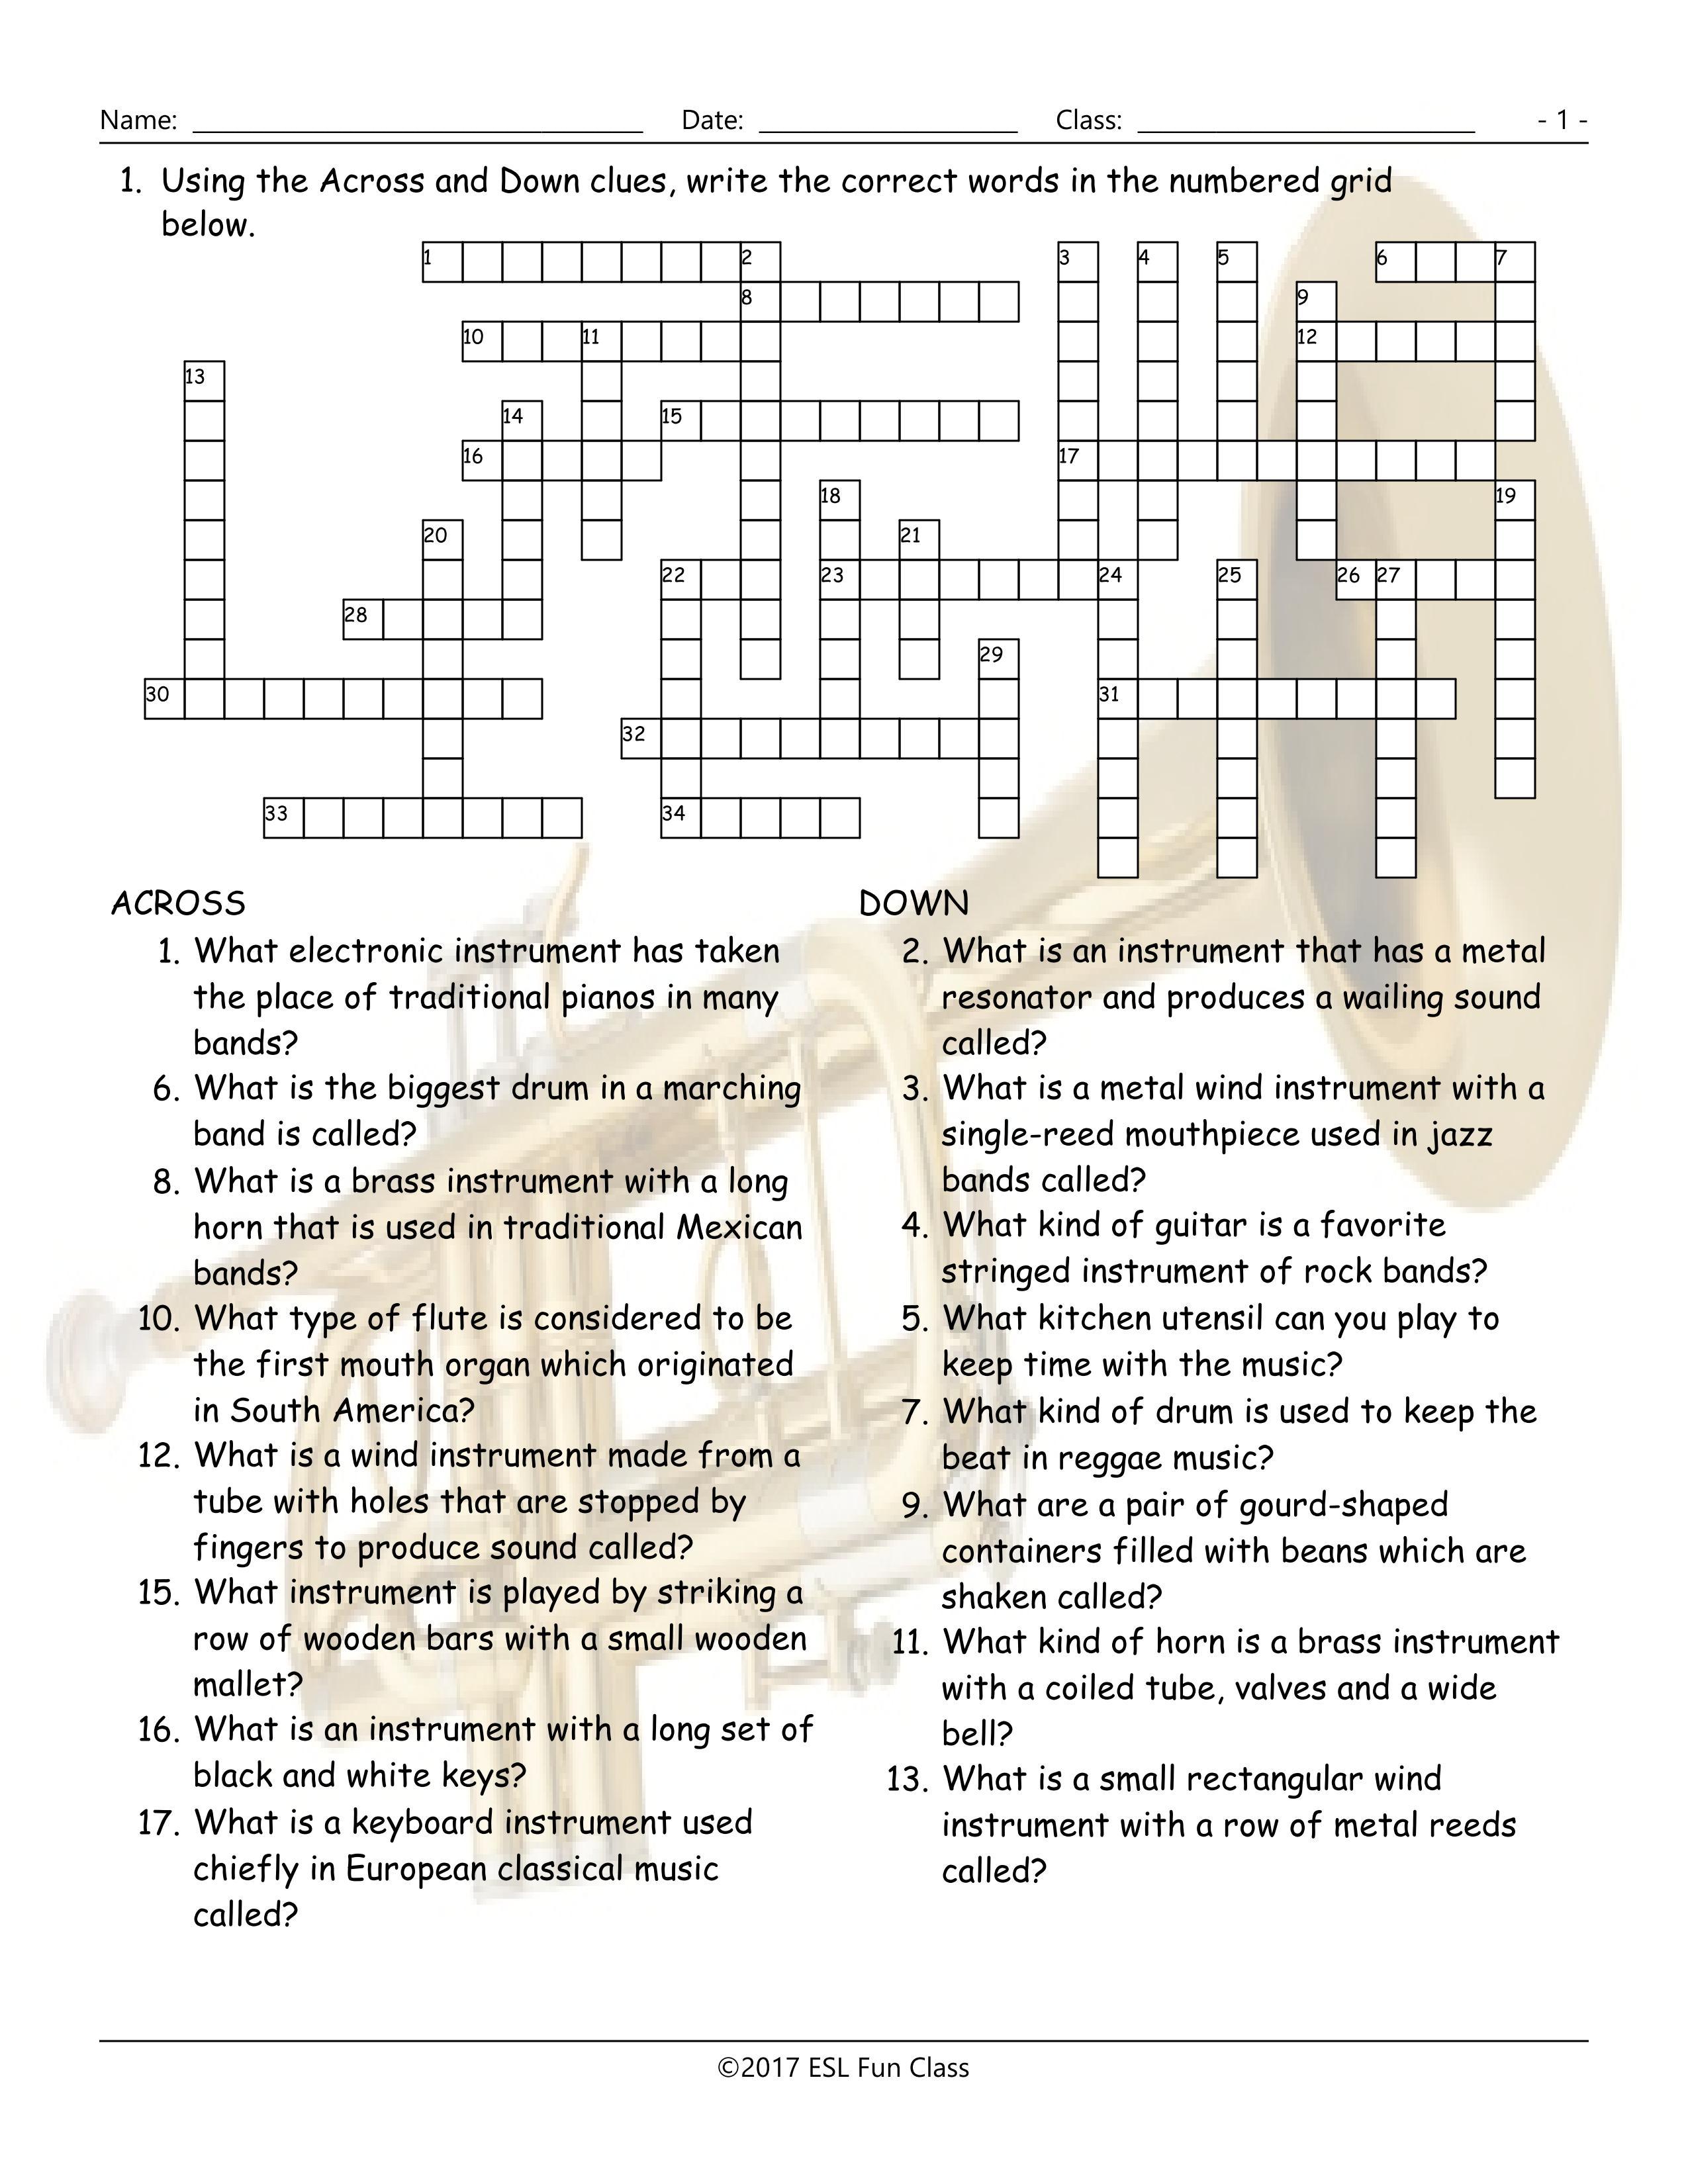 Musical Instruments Crossword Puzzle Worksheet-Esl Fun Games-Have Fun! - Vocabulary Crossword Puzzle Printable